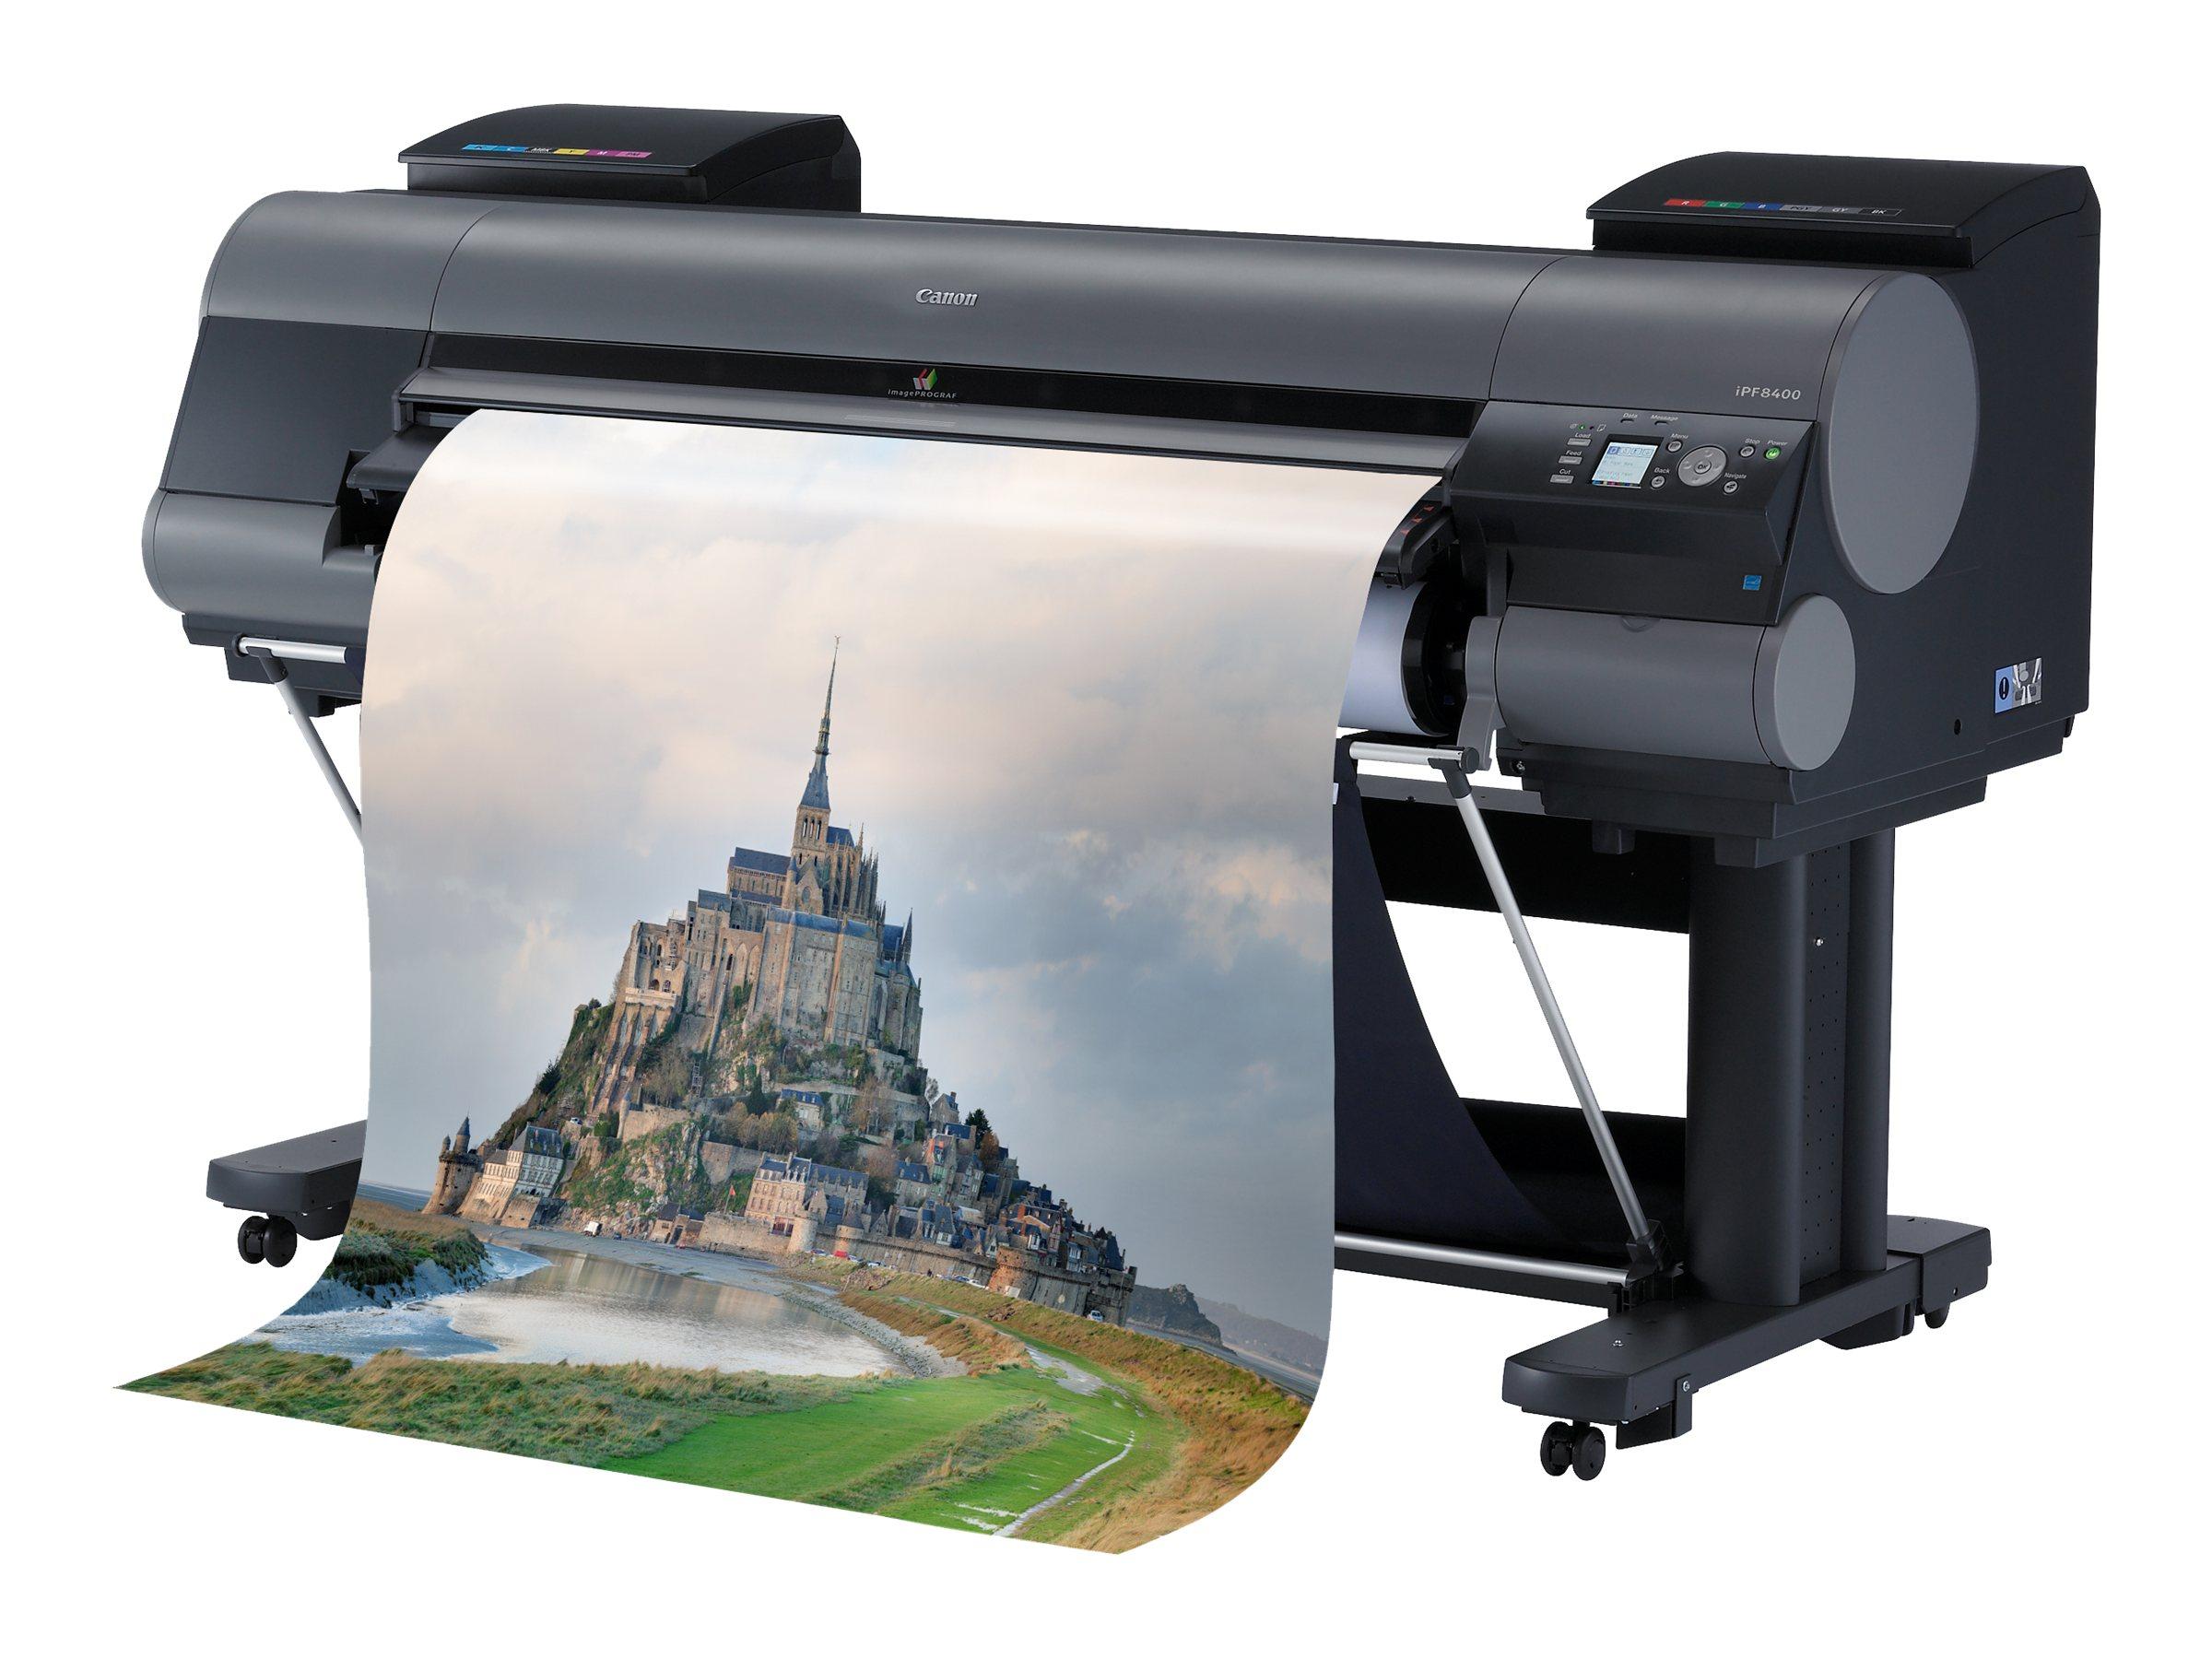 Canon imagePROGRAF iPF8400 Graphic Arts & Photo Printer